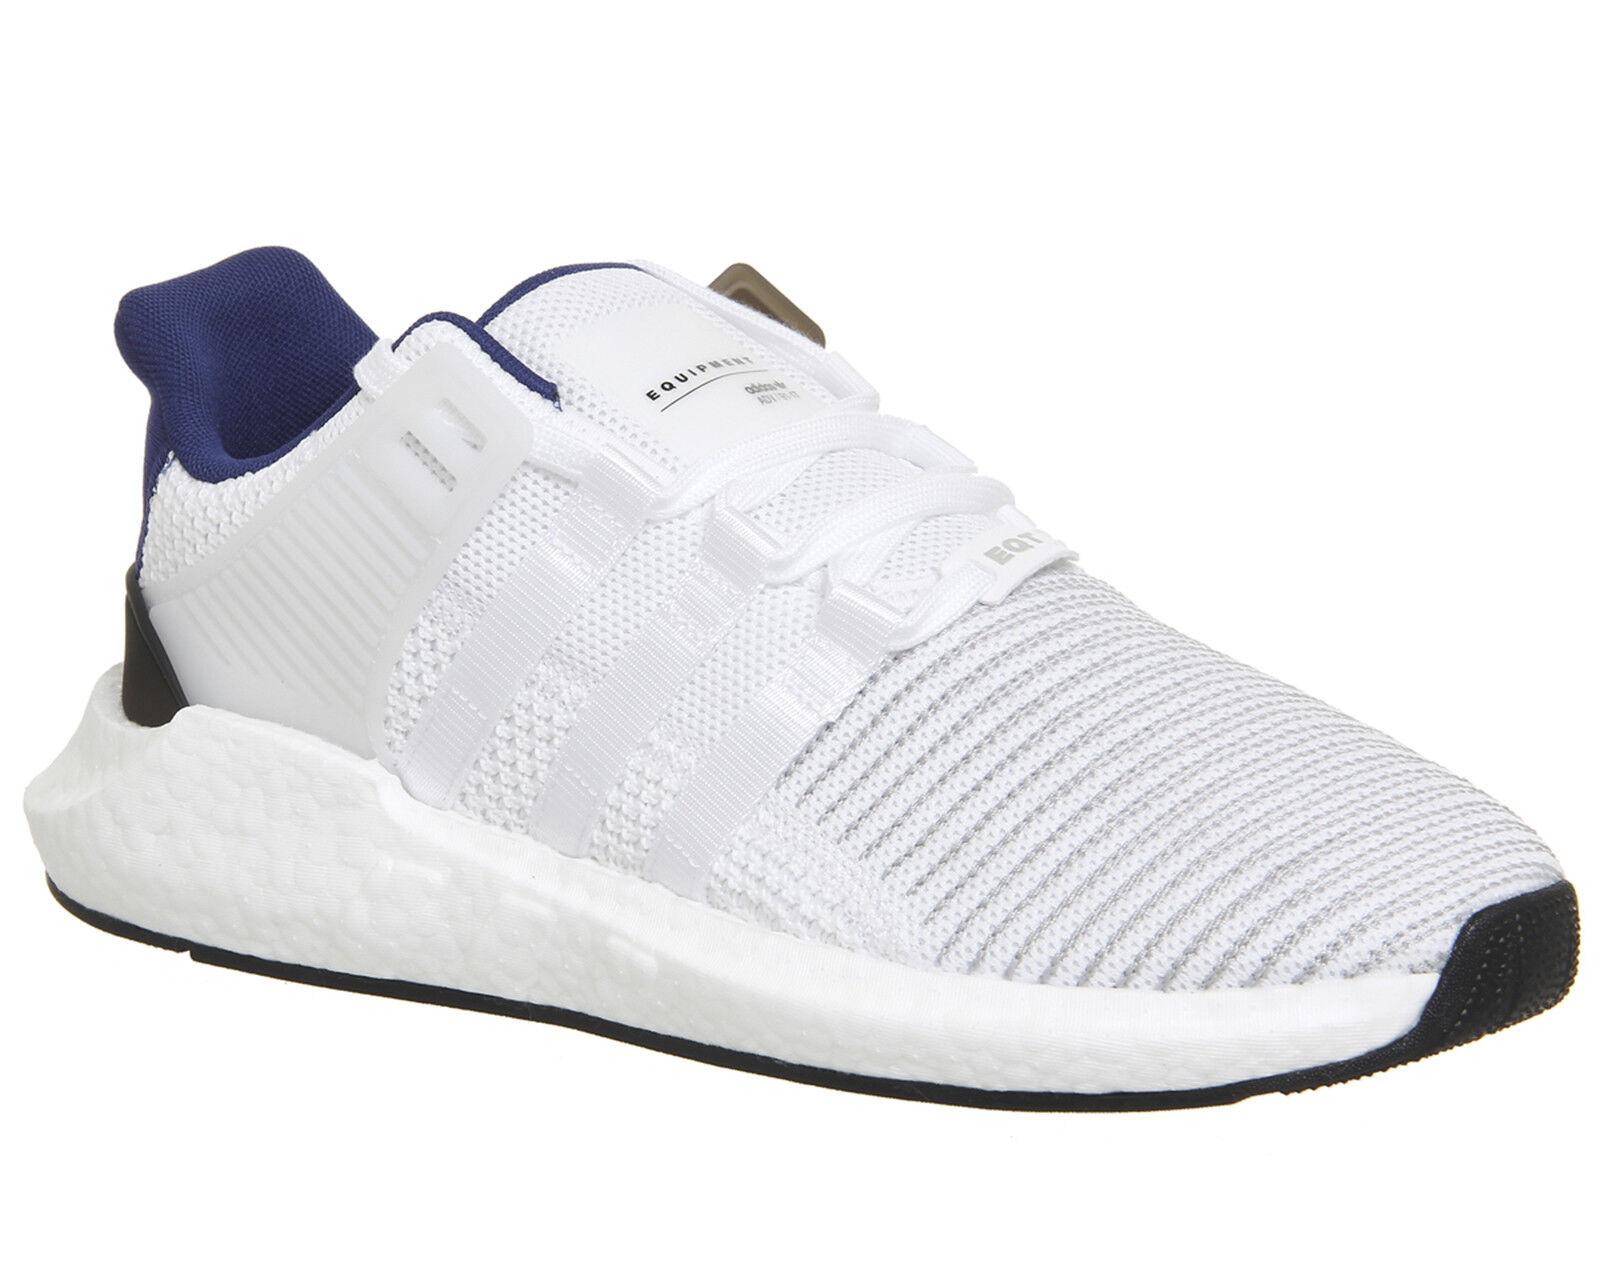 Adidas EQT Support 93 17 WHITE BLACK blueE Trainers UK 7 EU 40.7 LN086 UU 01